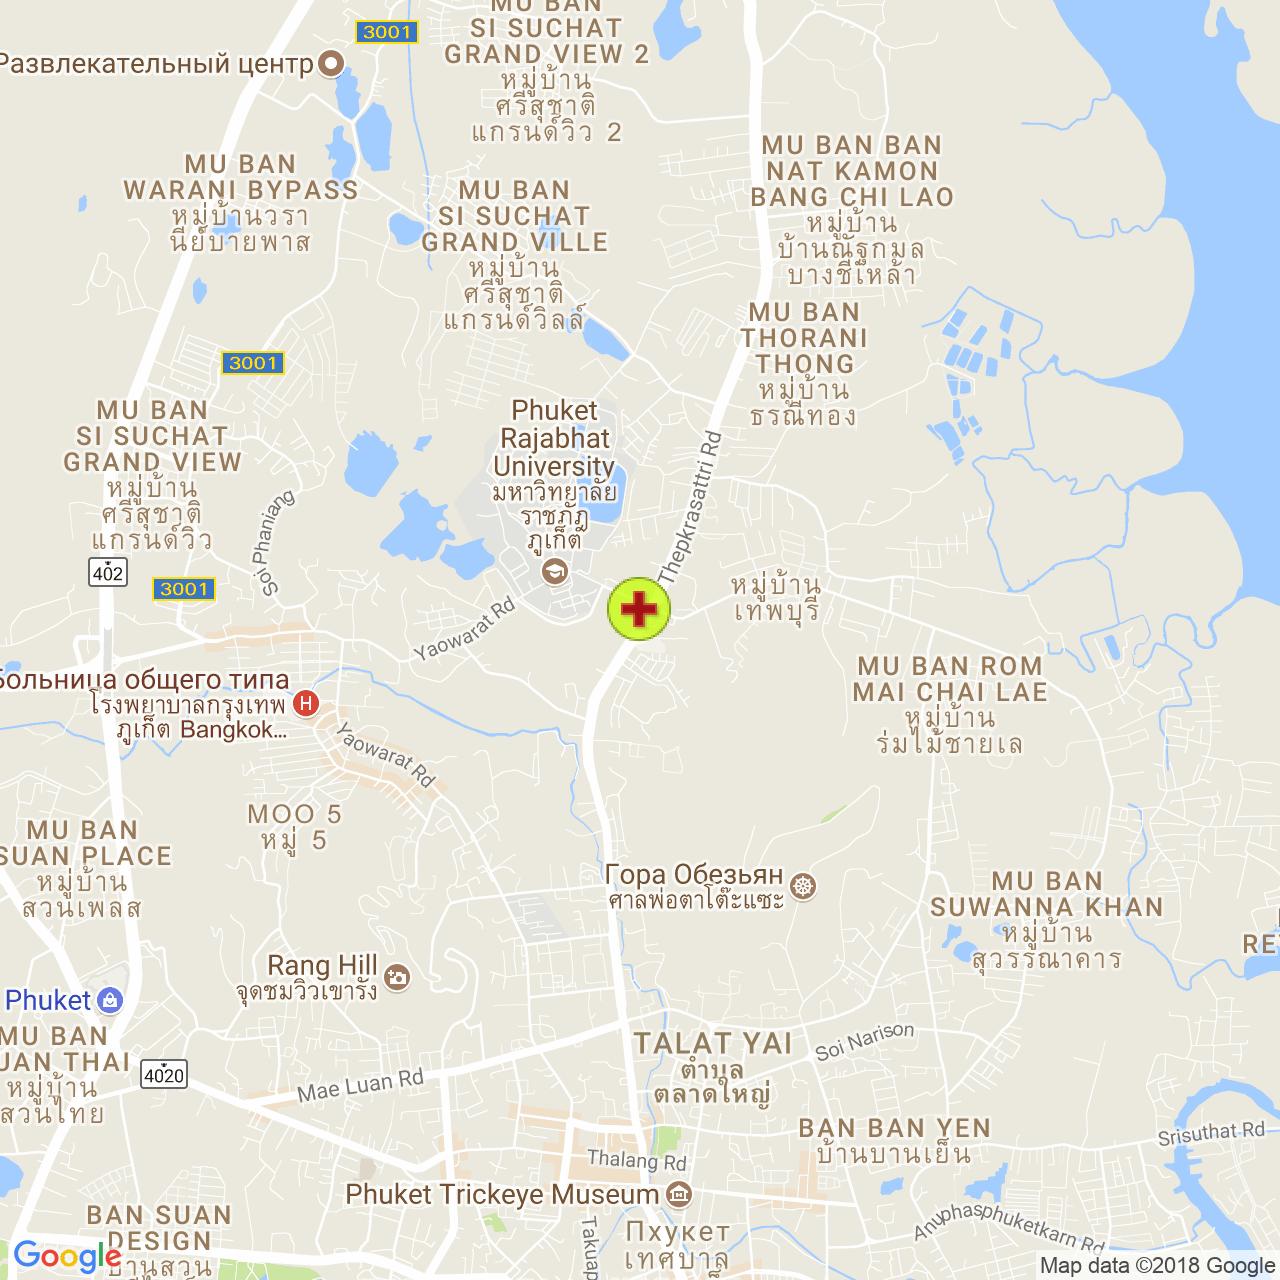 Госпиталь Мишшин (Mission) на карте Пхукета